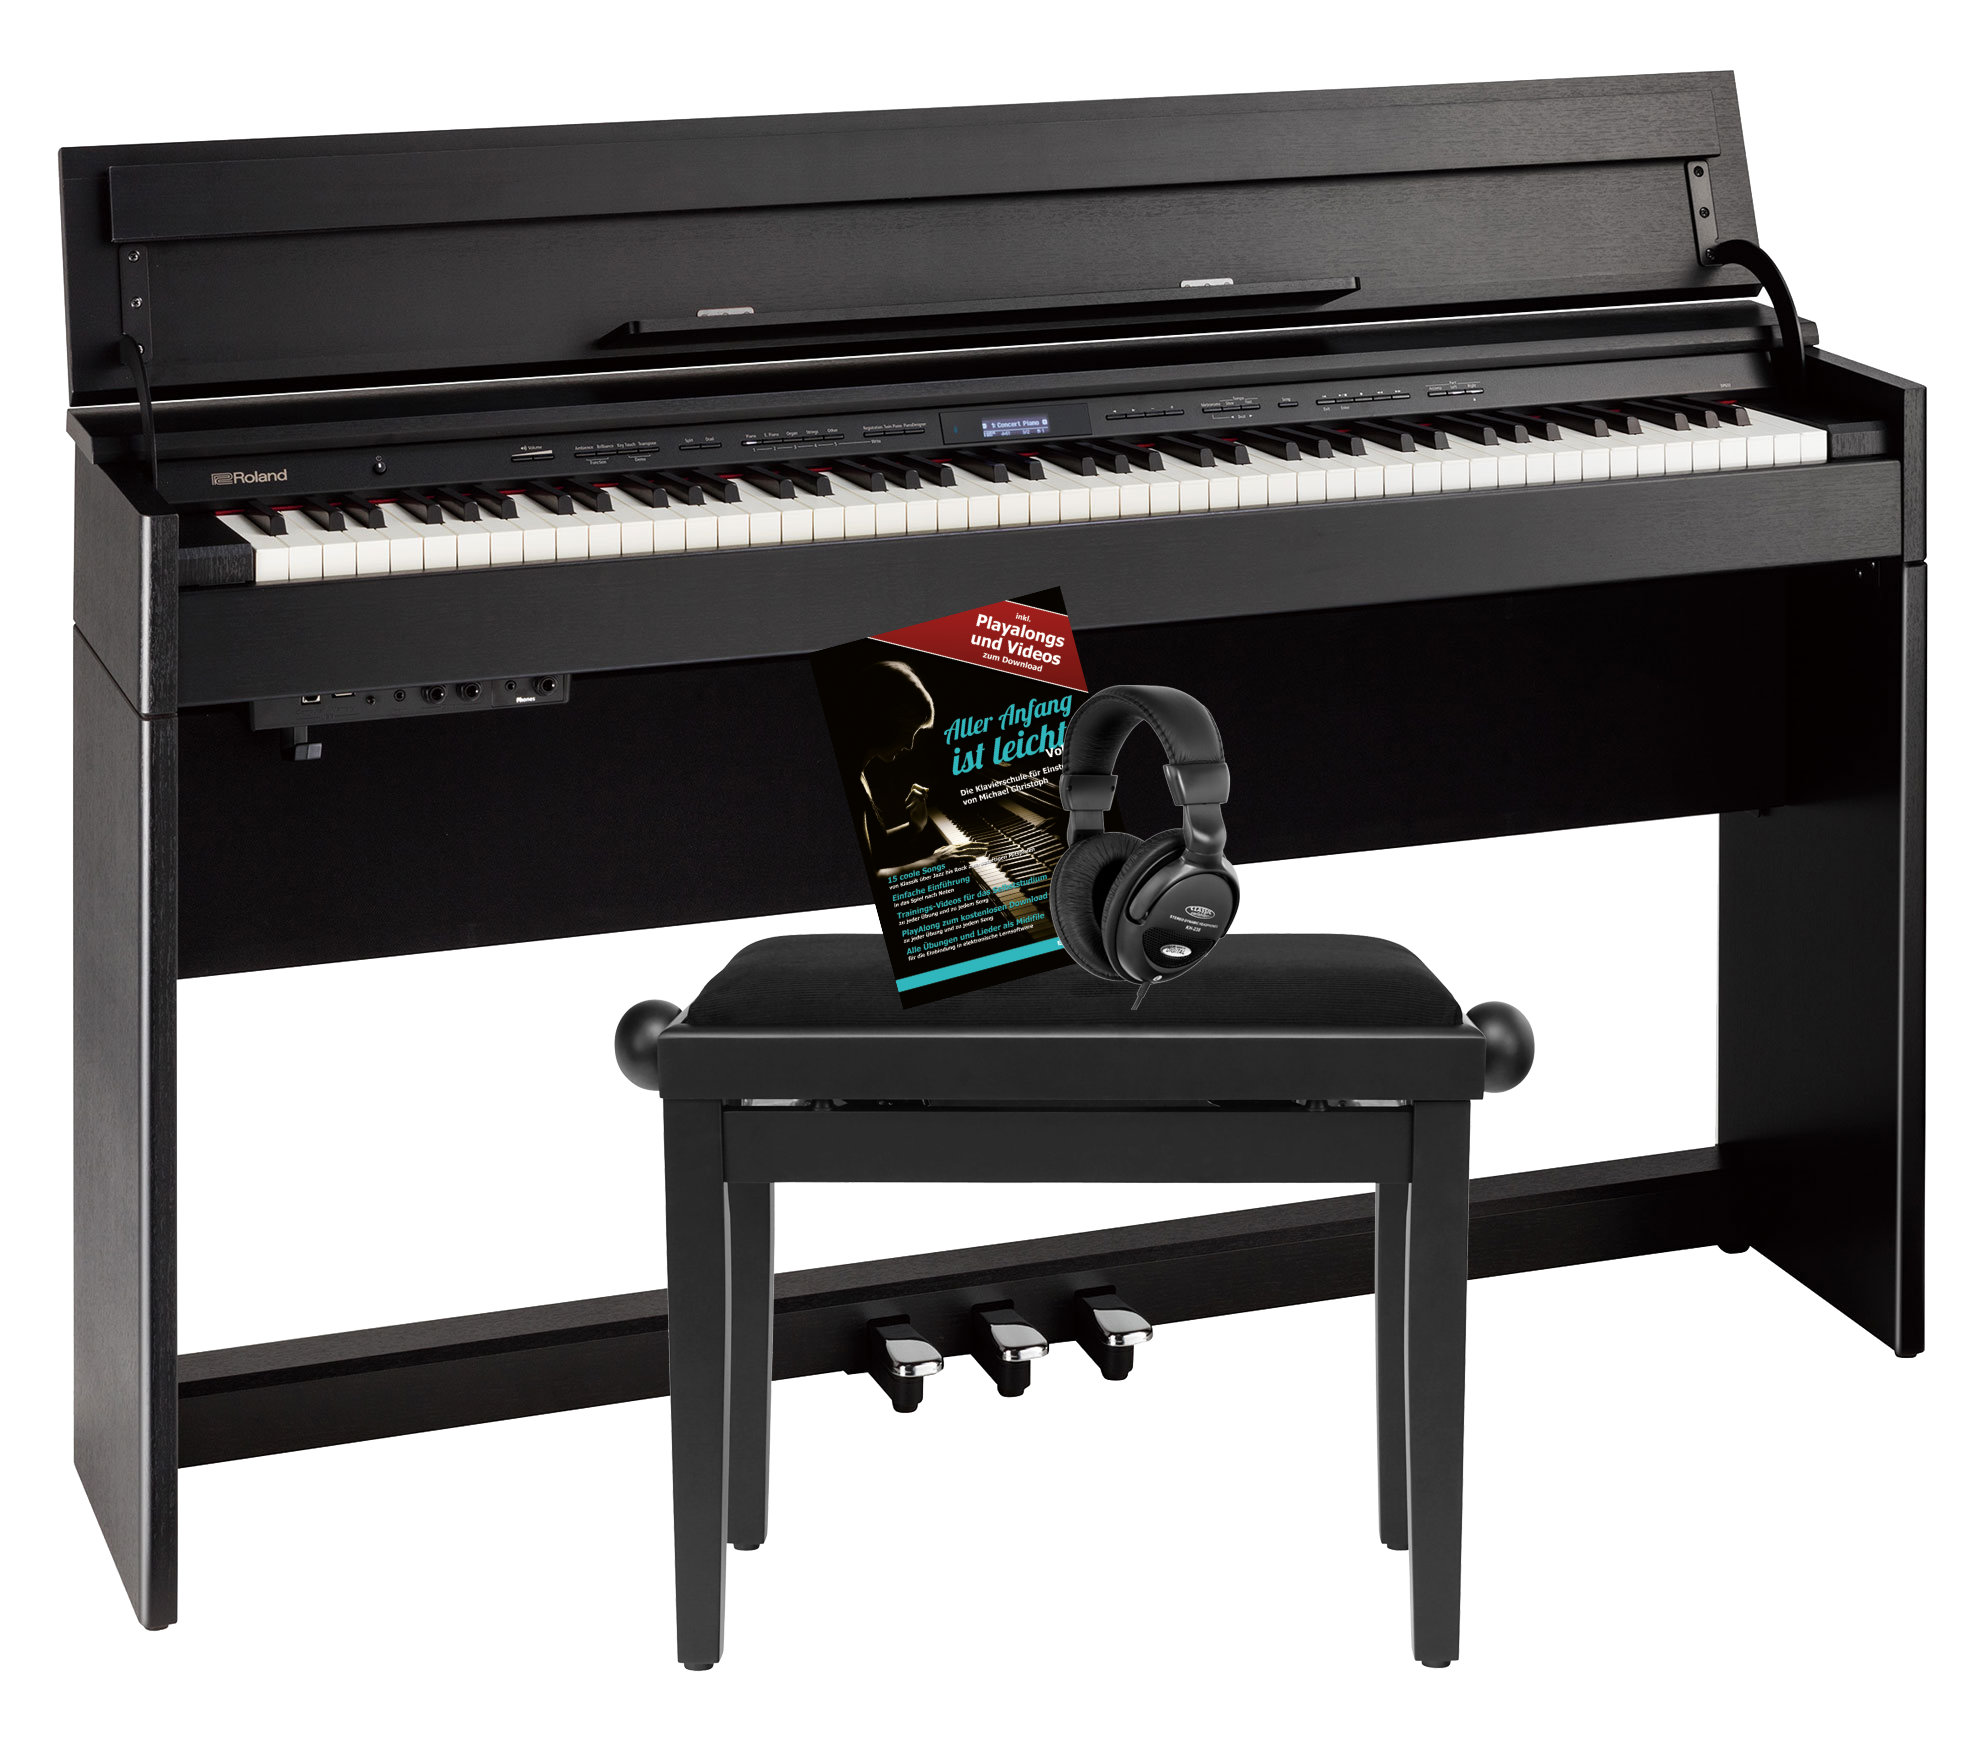 Digitalpianos - Roland DP603 CB Digitalpiano Set Schwarz Matt - Onlineshop Musikhaus Kirstein